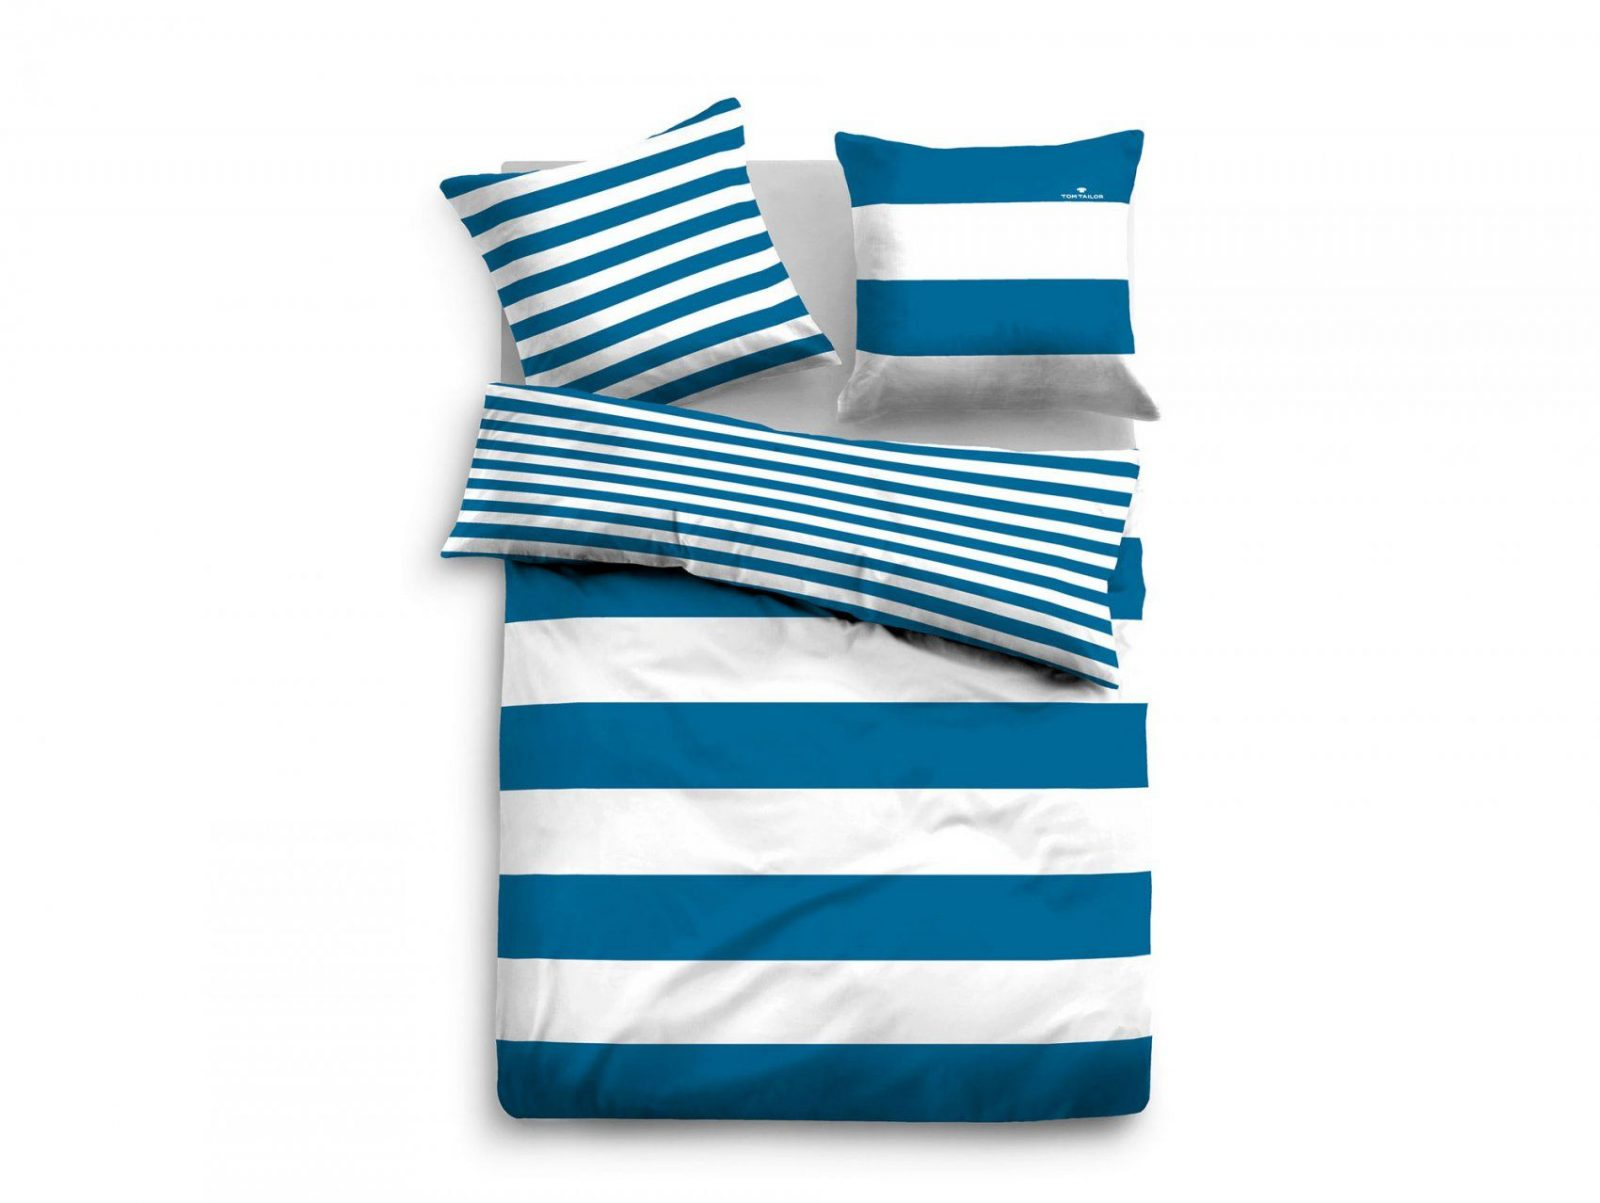 Tom Tailor Bettwäsche Linon Bed Linen 135X200+80X80 Cm von Tom Tailor Bettwäsche 135X200 Bild